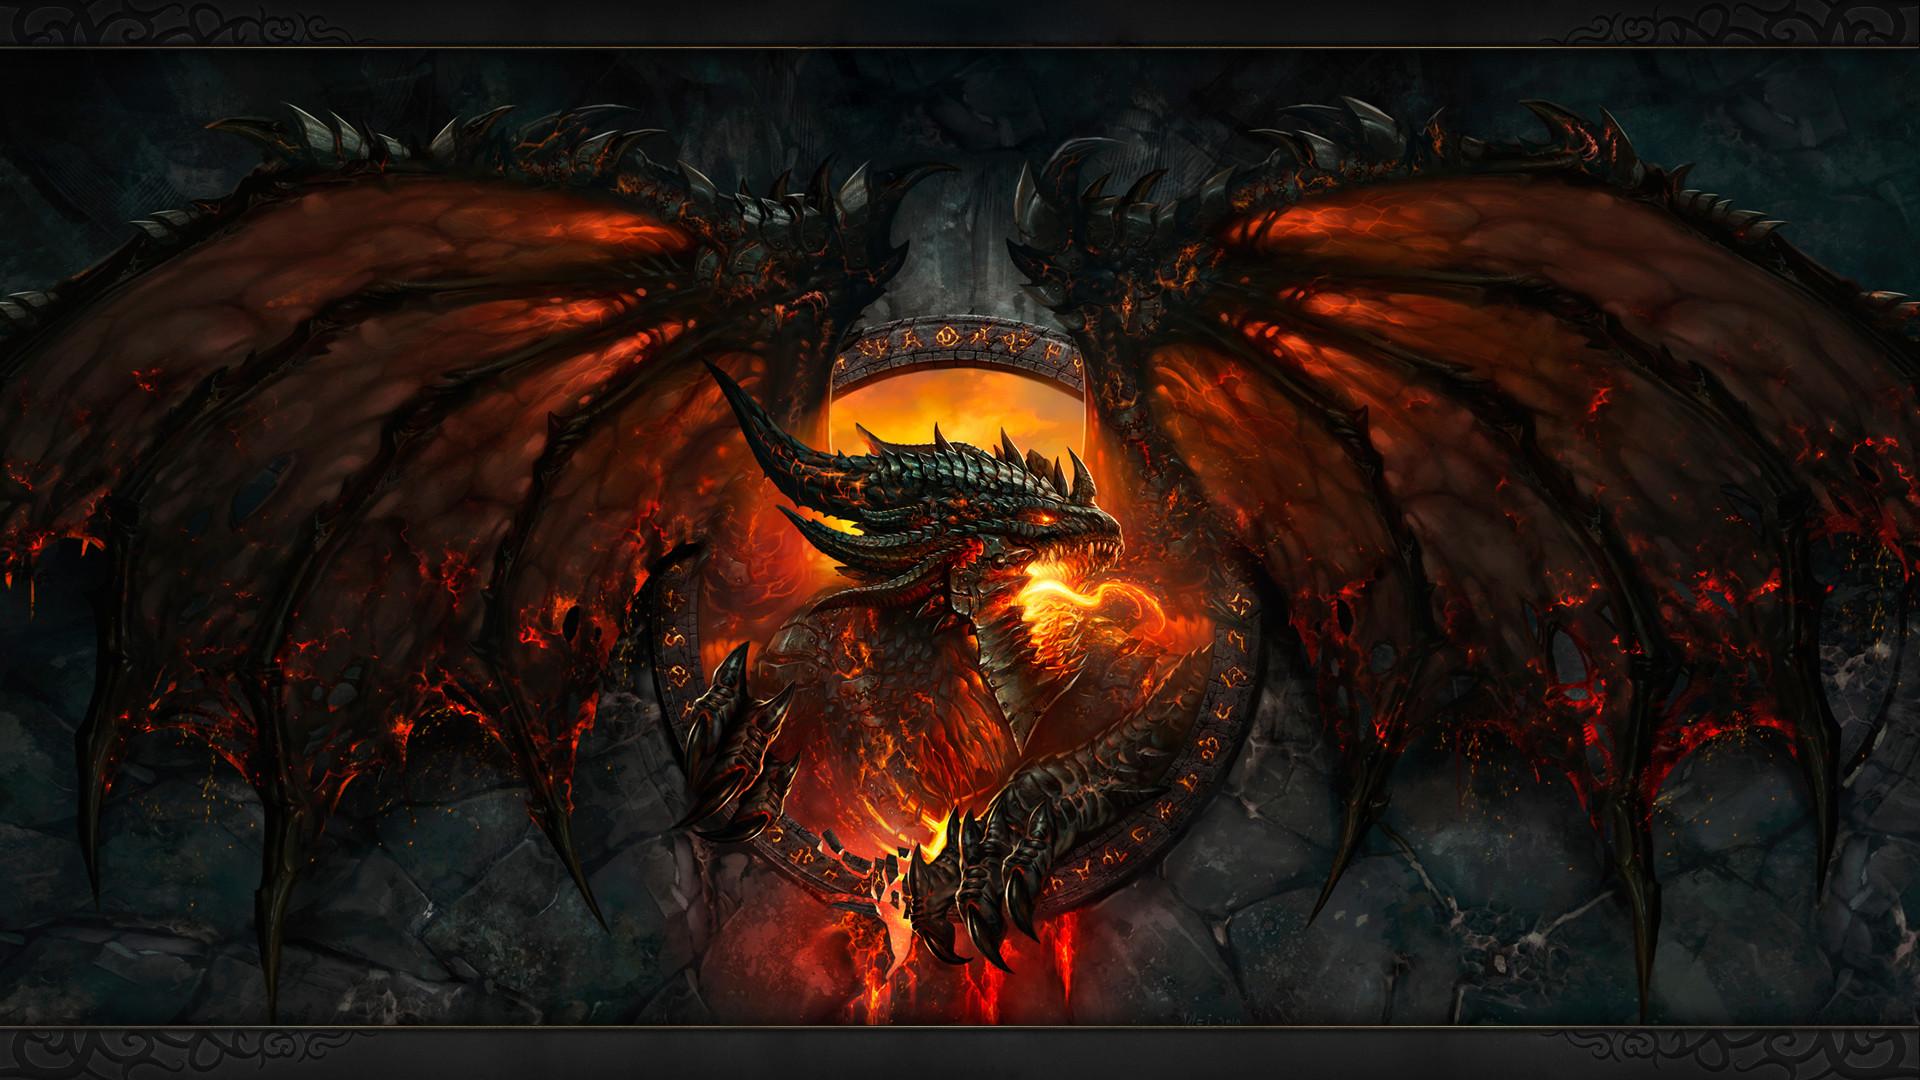 Blizzard Wow Cataclysm Fire Dragon Wallpaper – https://www.gbwallpapers.com